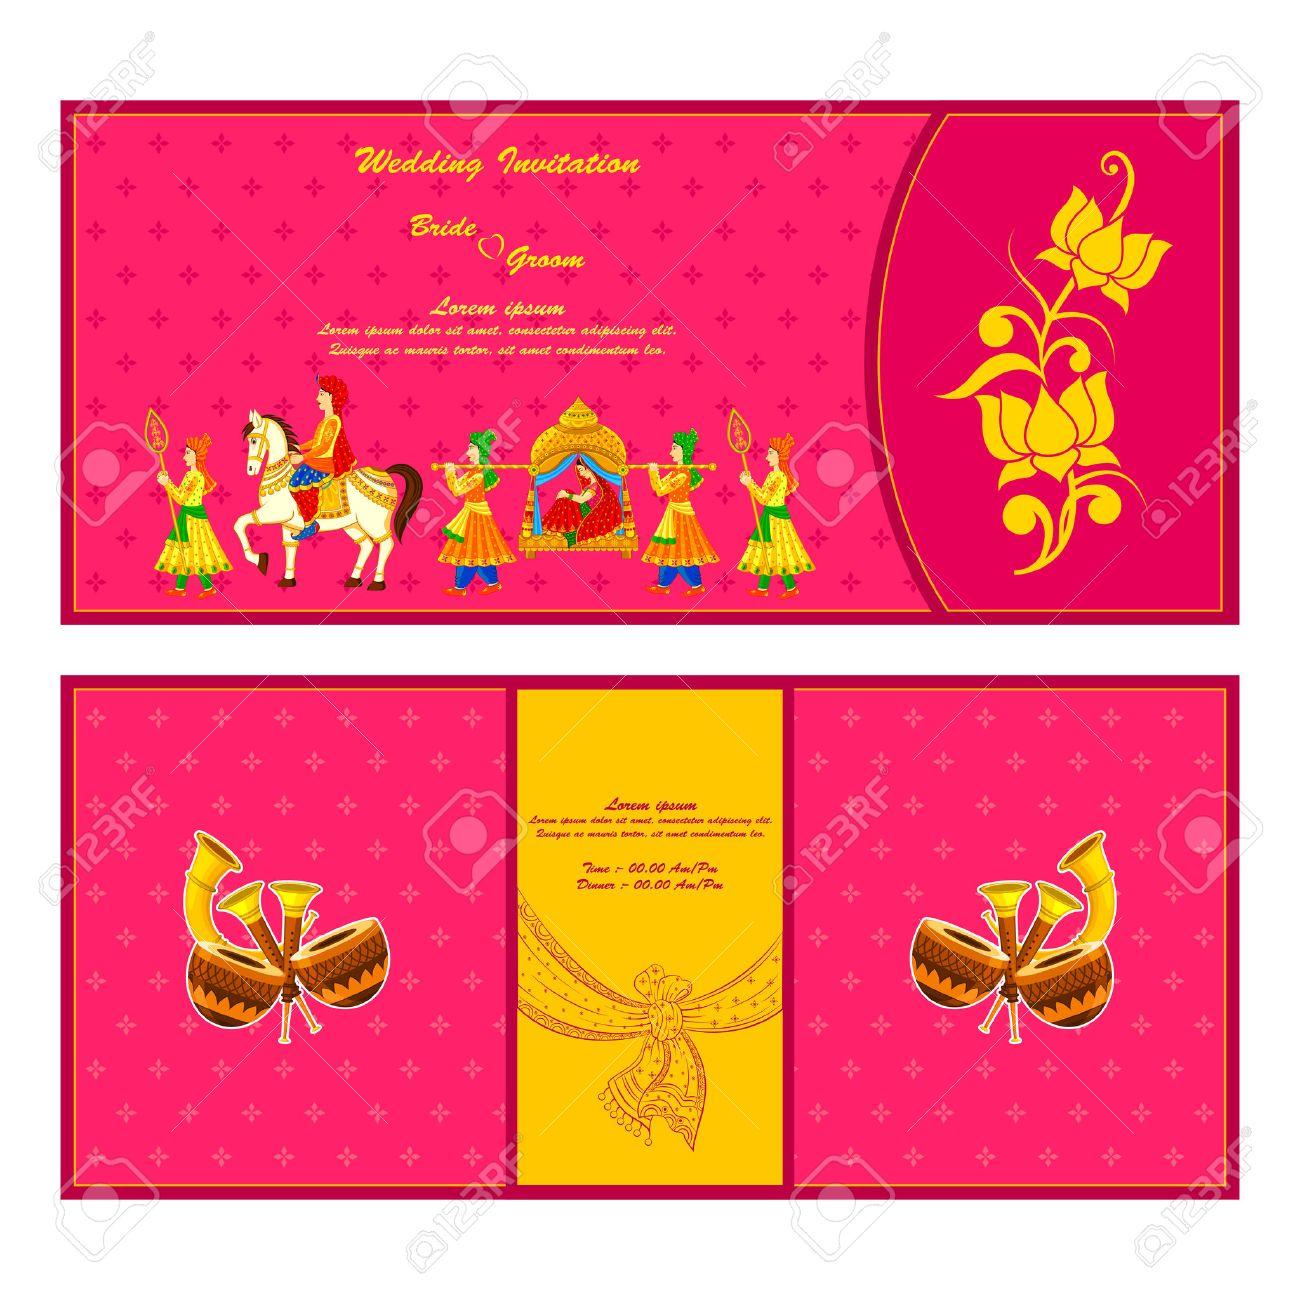 photo vector illustration of indian wedding invitation card indian wedding invitation Vector vector illustration of Indian wedding invitation card